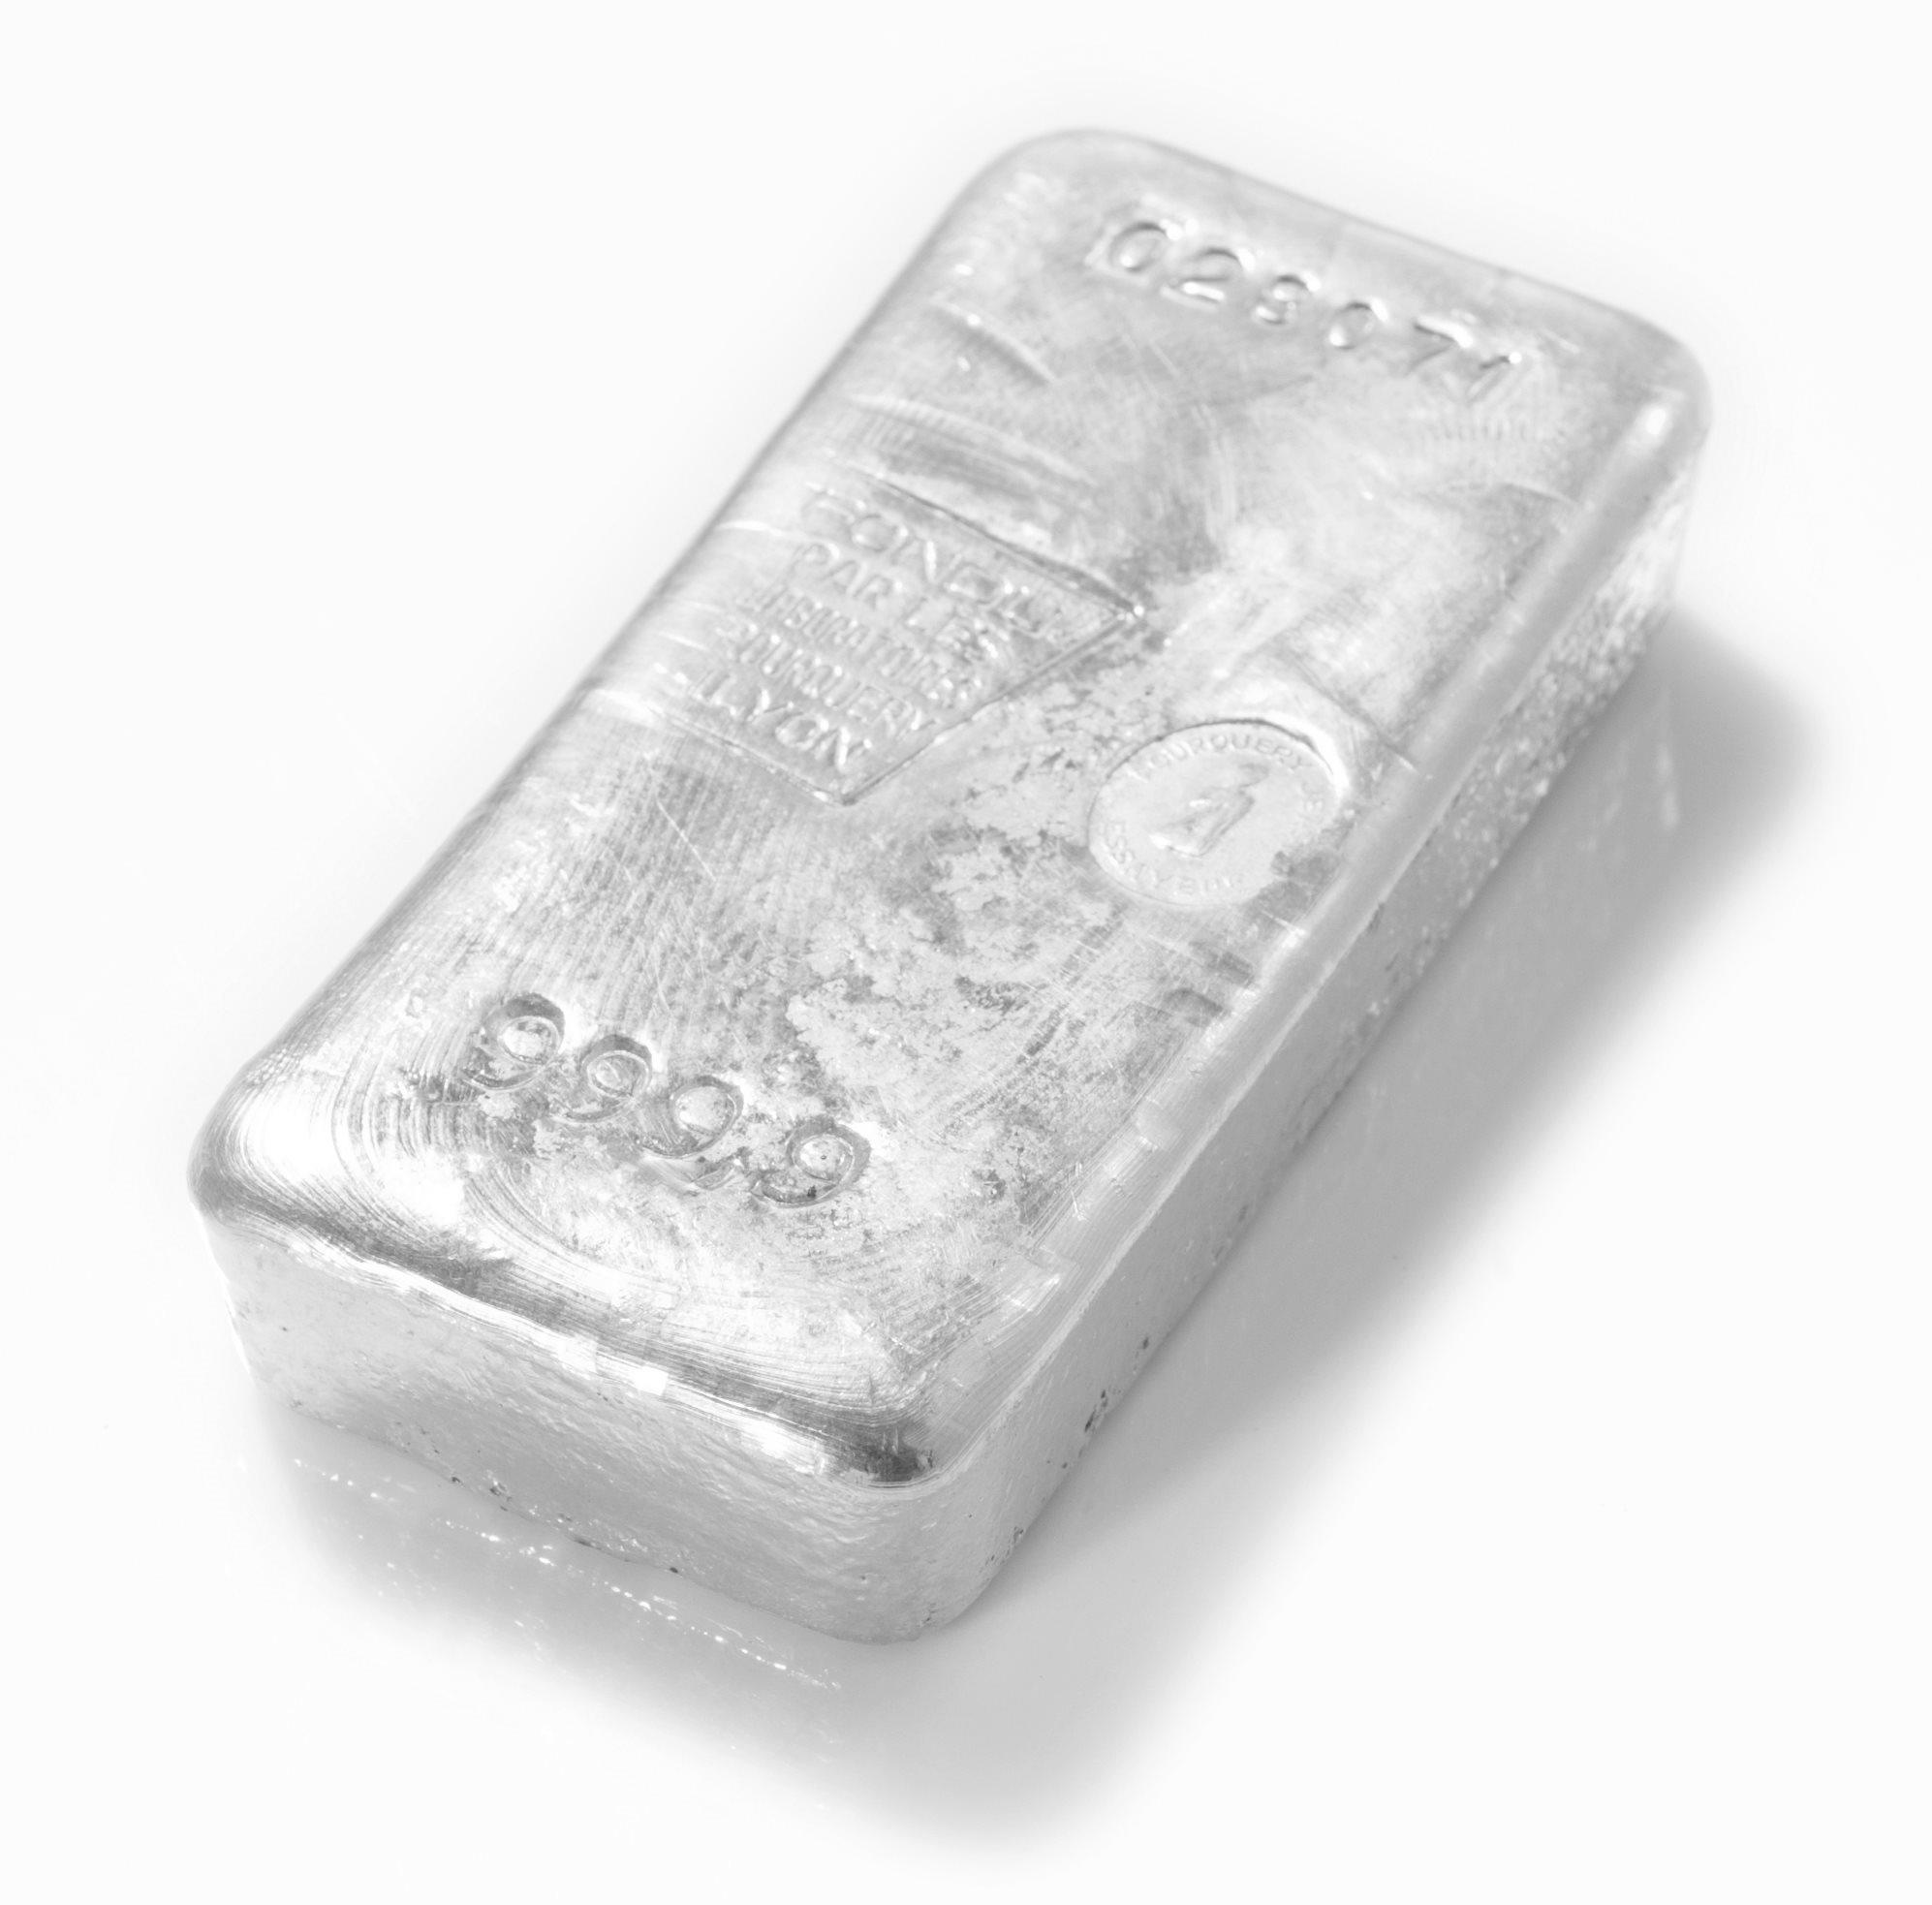 Lingot de Palladium 1 Kg en Or